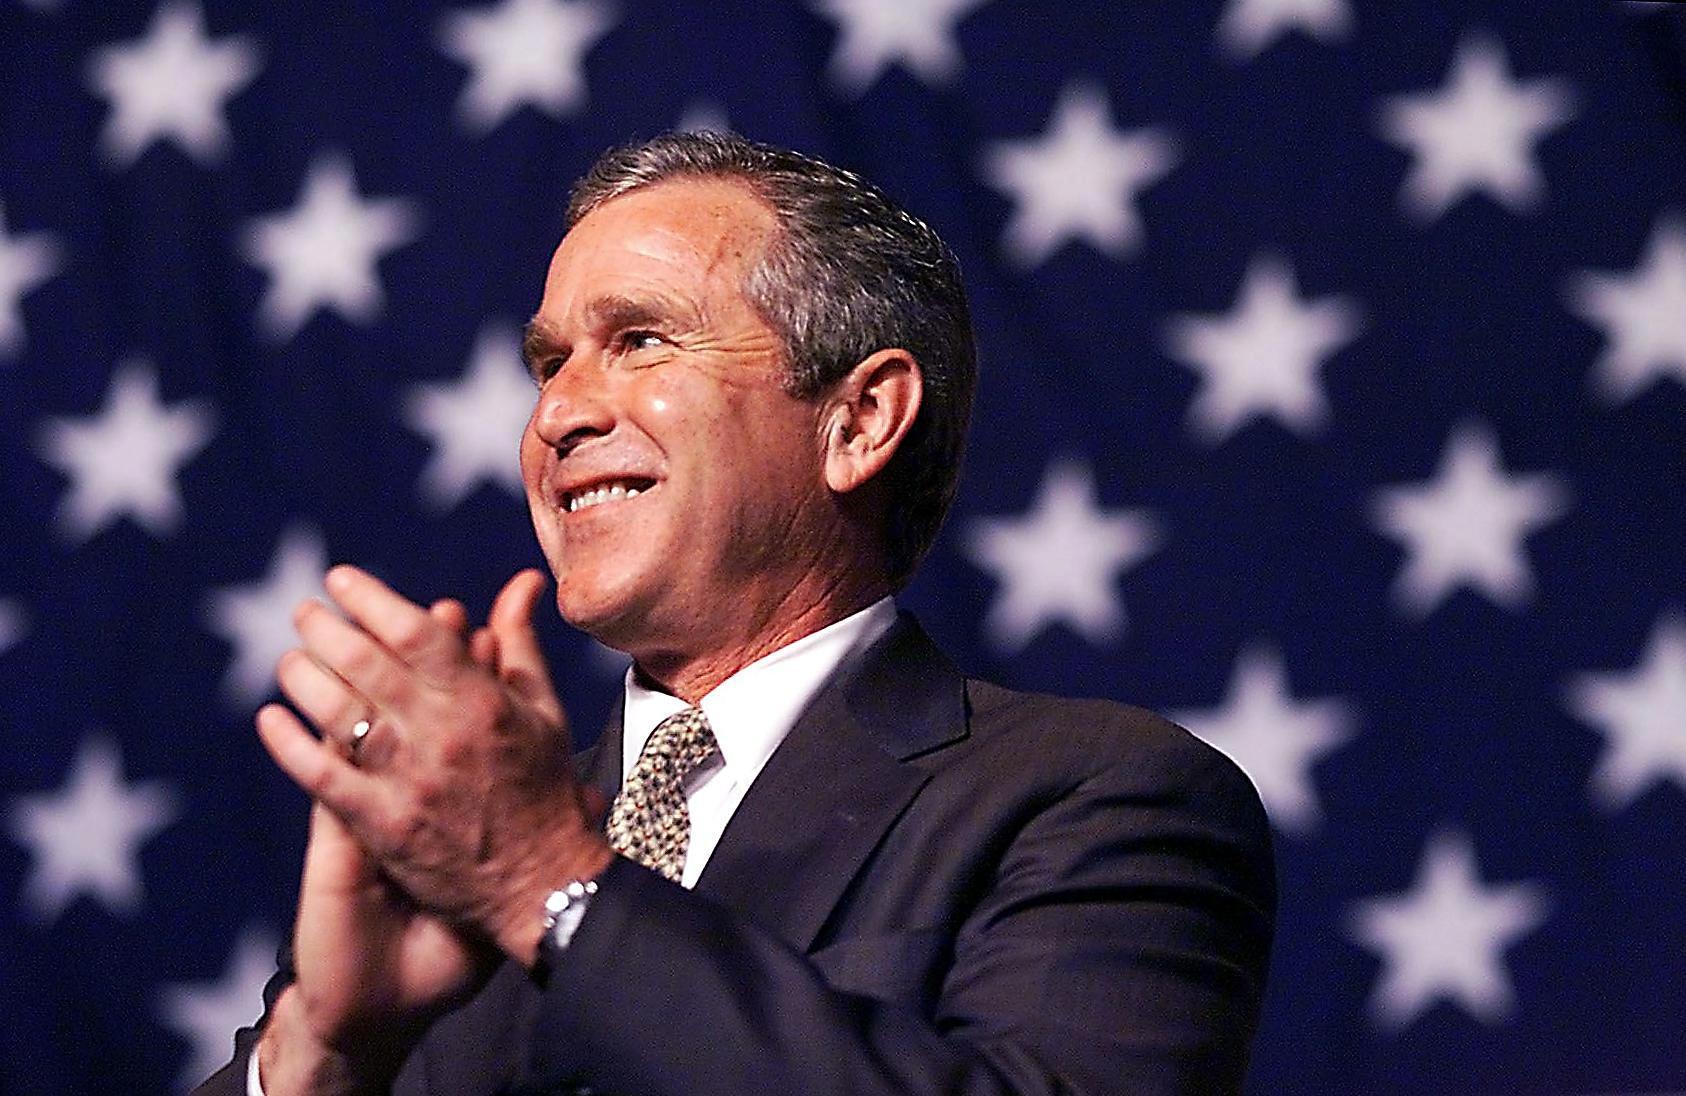 Republican presidential candidate George W. Bush